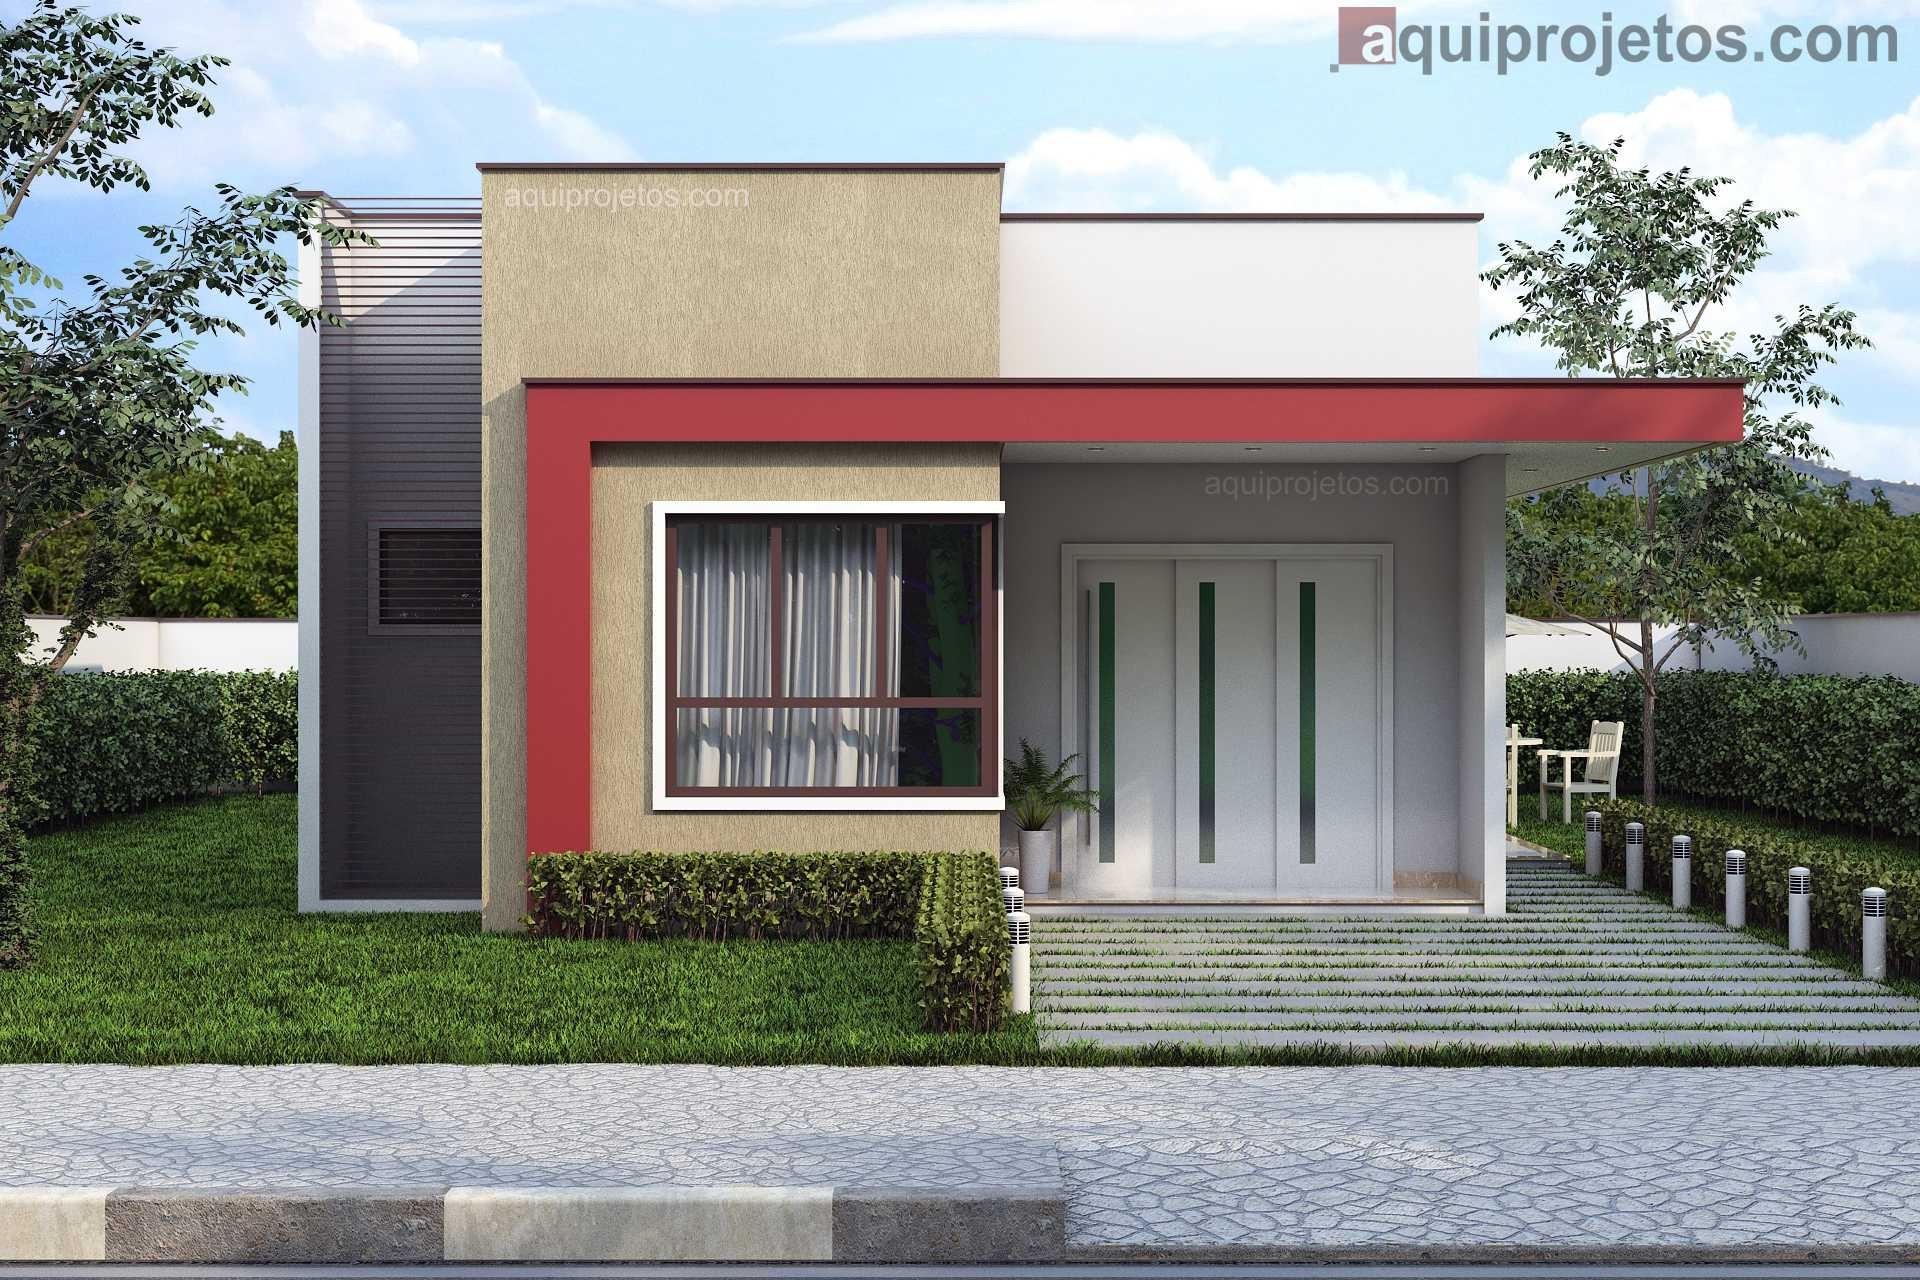 Fachada frontal moderna casa térrea 1 pavimento - Projeto Maceió - Cod G13 – aquiprojetos